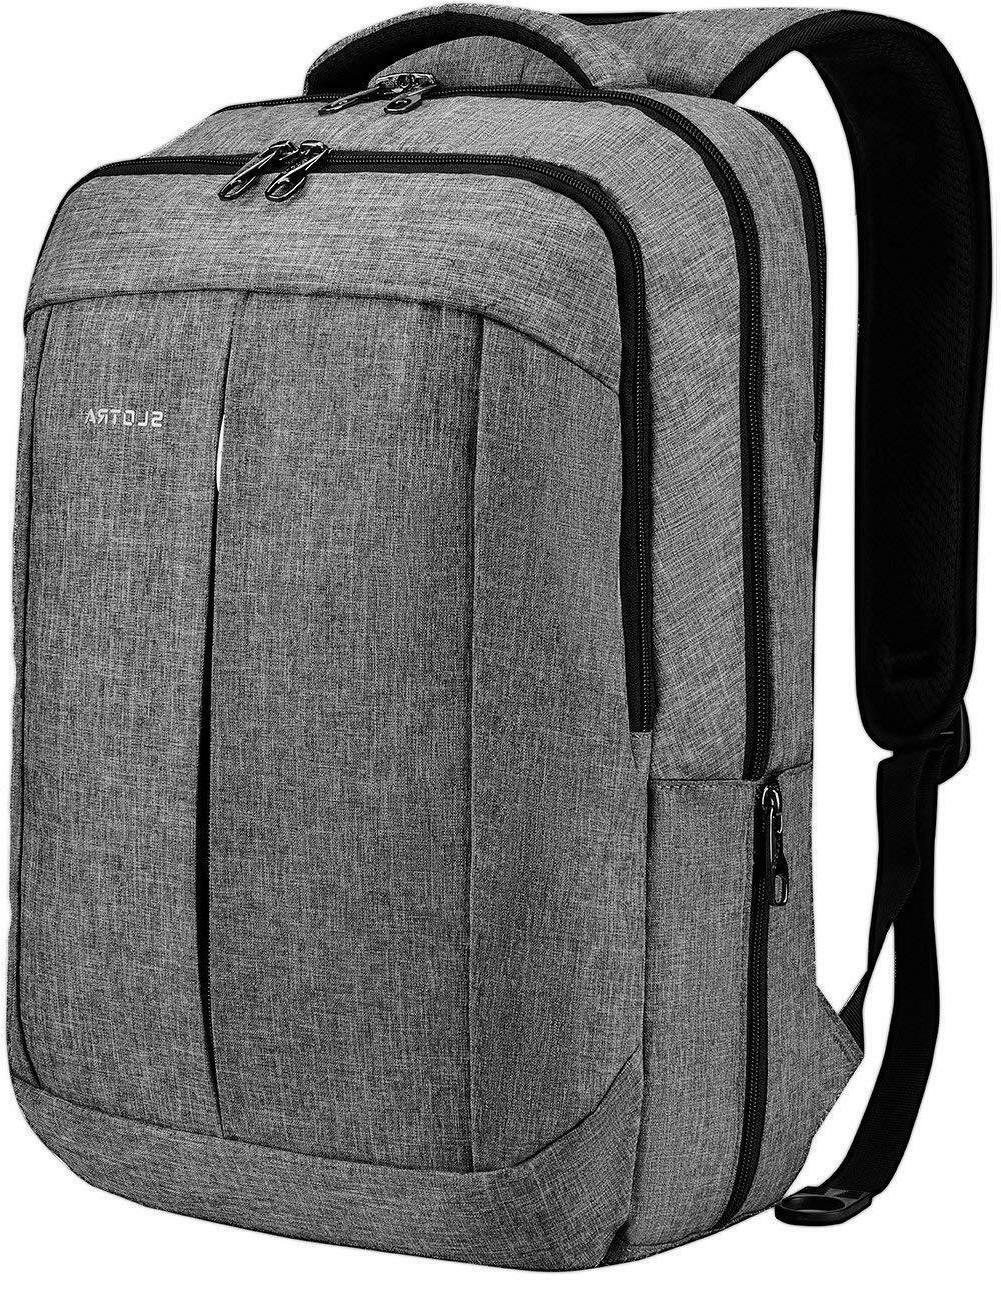 17 Inch Laptop Backpack for Men Women Business Travel Bag Ca